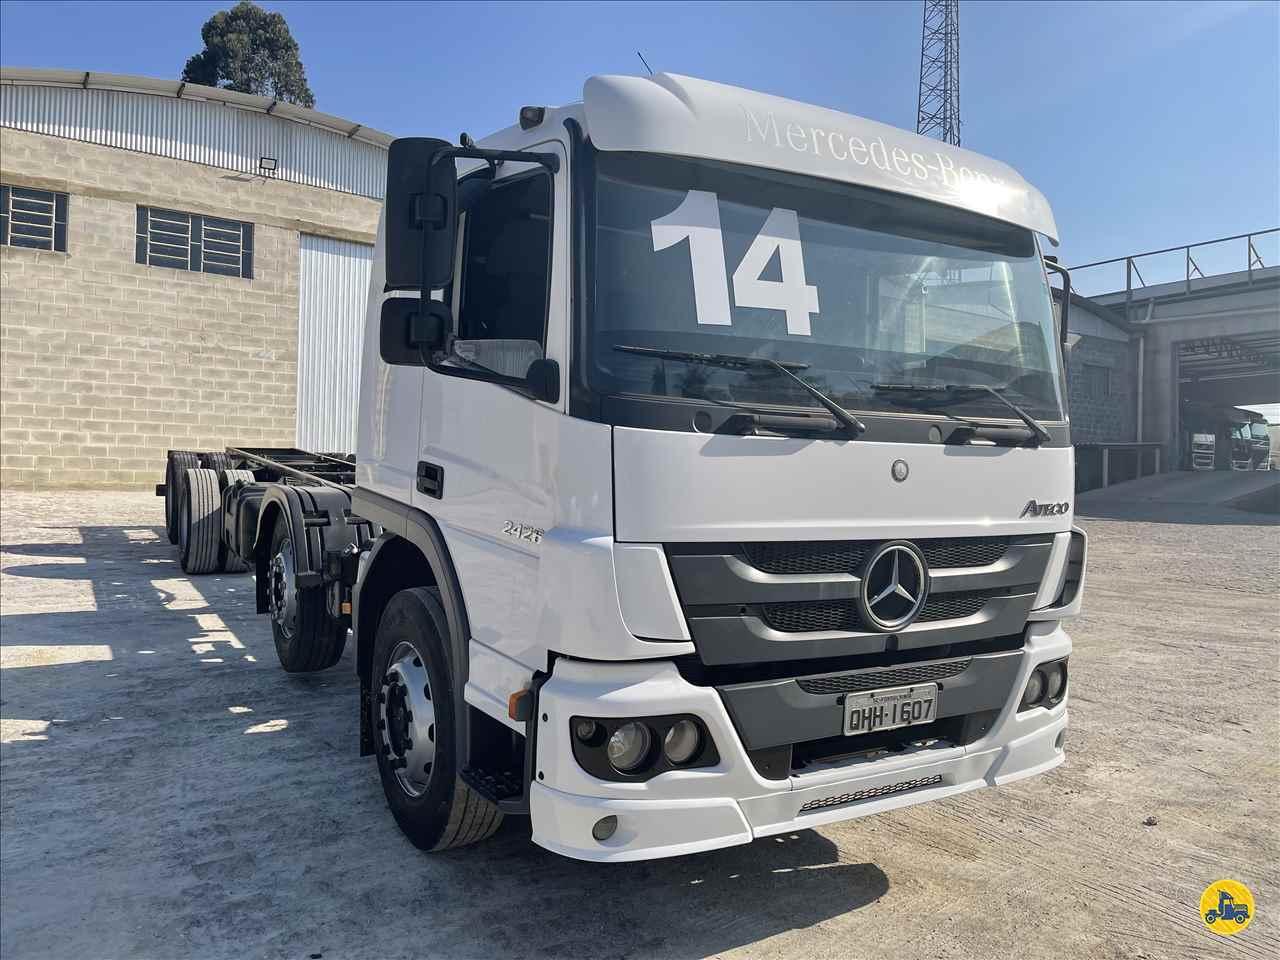 MB 2426 de Rodricardo Caminhões - COLOMBO/PR